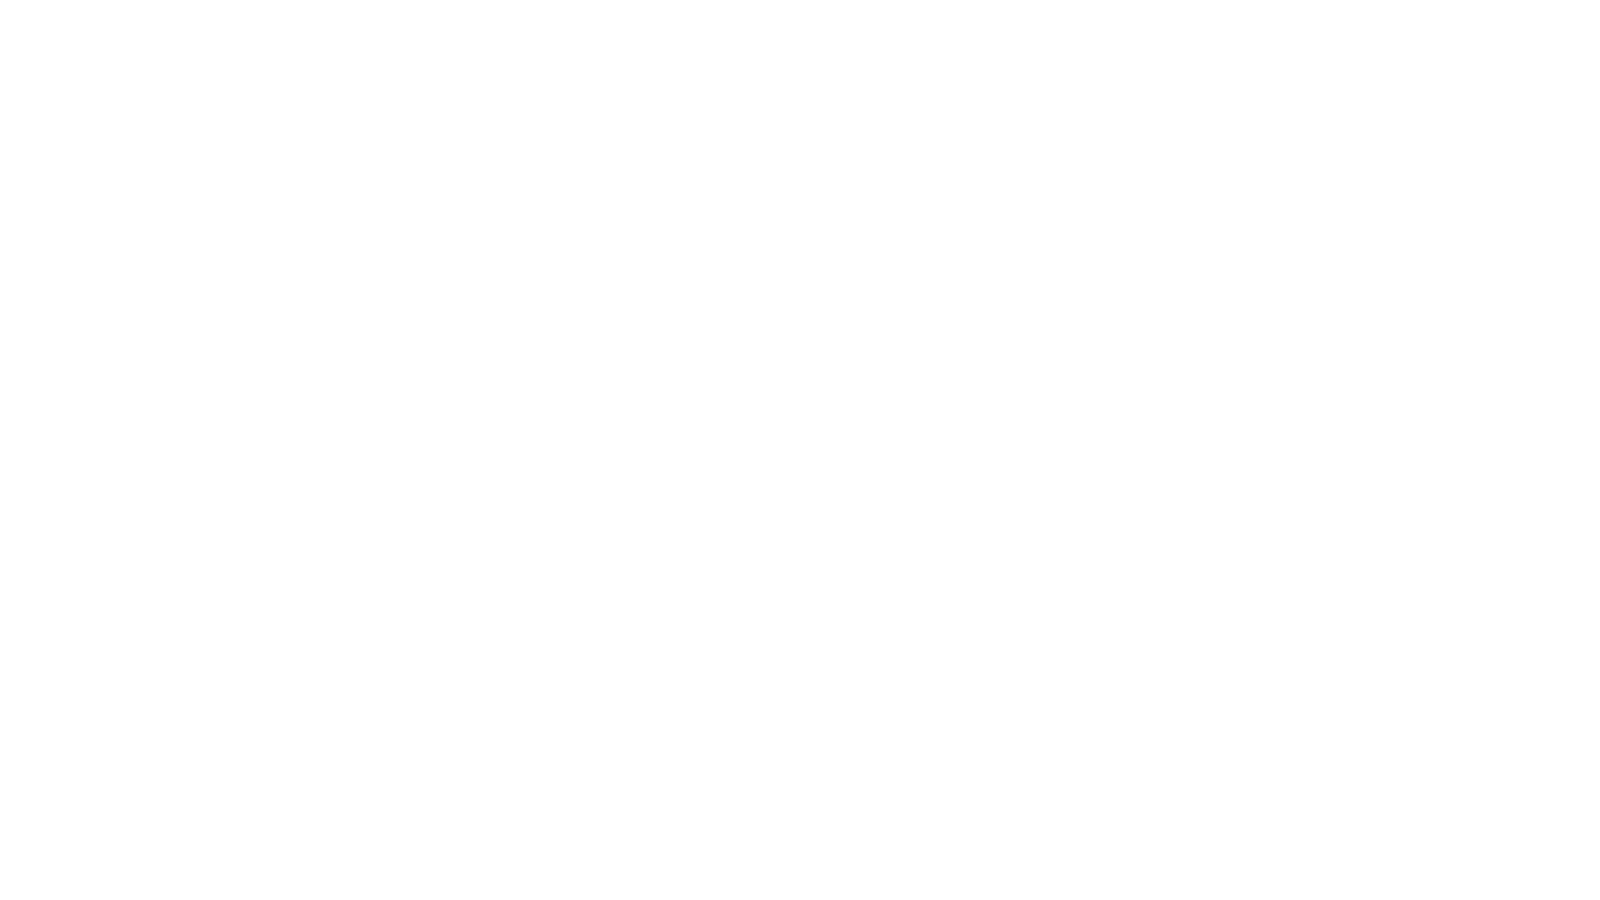 "LETSS Talk mengadakan serial coaching penulisan dan publikasi sebagai salah satu kegiatan penguatan kapasitas bagi komunitas internal ""Keluarga LETSS Talk."" Ini adalah seri kedua yang fokus pada penulisan dan publikasi fiksi dengan instruktur Dian Nafi, seorang cerpenis dan novelis produktif. Kegiatan diadakan pada Minggu, 21 Februari 2021.   Dipandu moderator Farid Muttaqin, kegiatan ini dilengkapi Juru Bahasa Isyarat (JBI), yaitu Chiki dan Isti.  Dengan versi YouTube ini semoga coaching penulisan dan publikasi ini bisa bermanfaat untuk audiens lebih banyak."